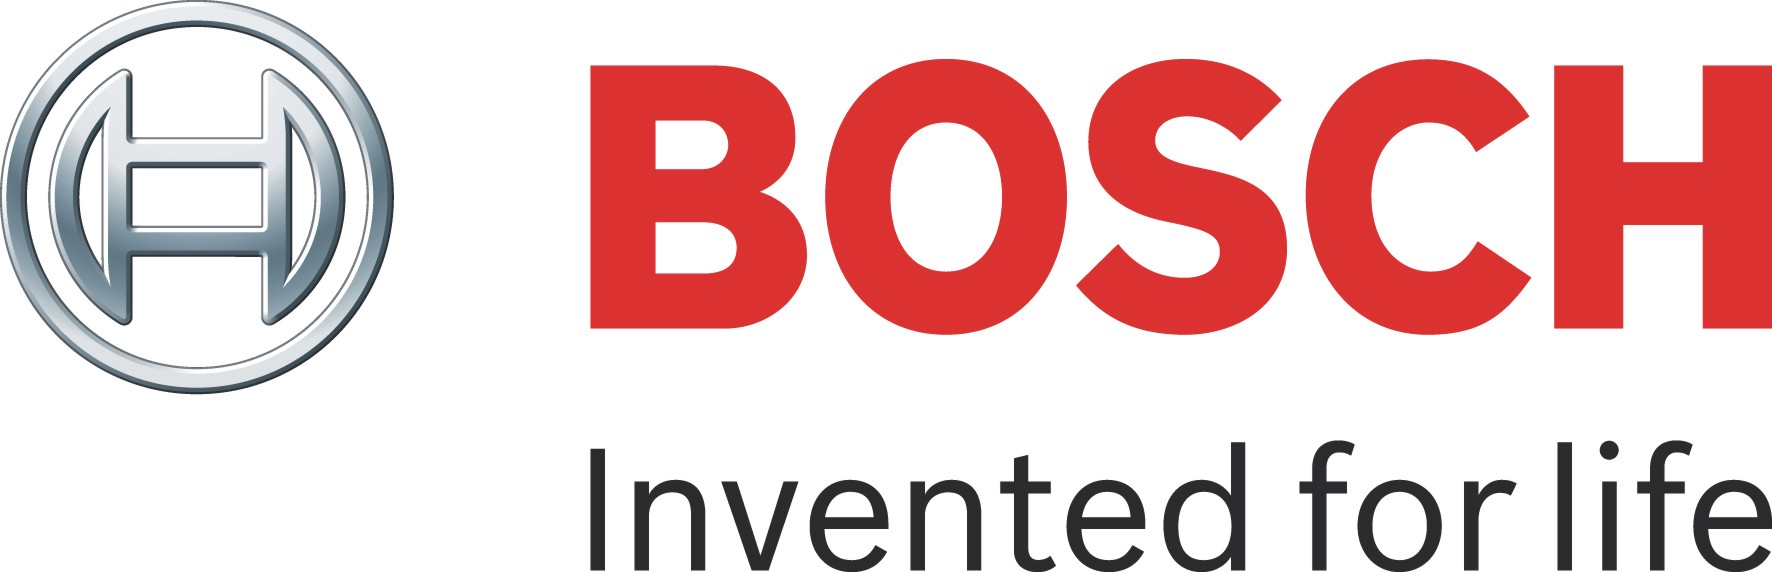 Bosch_Logo_JPG